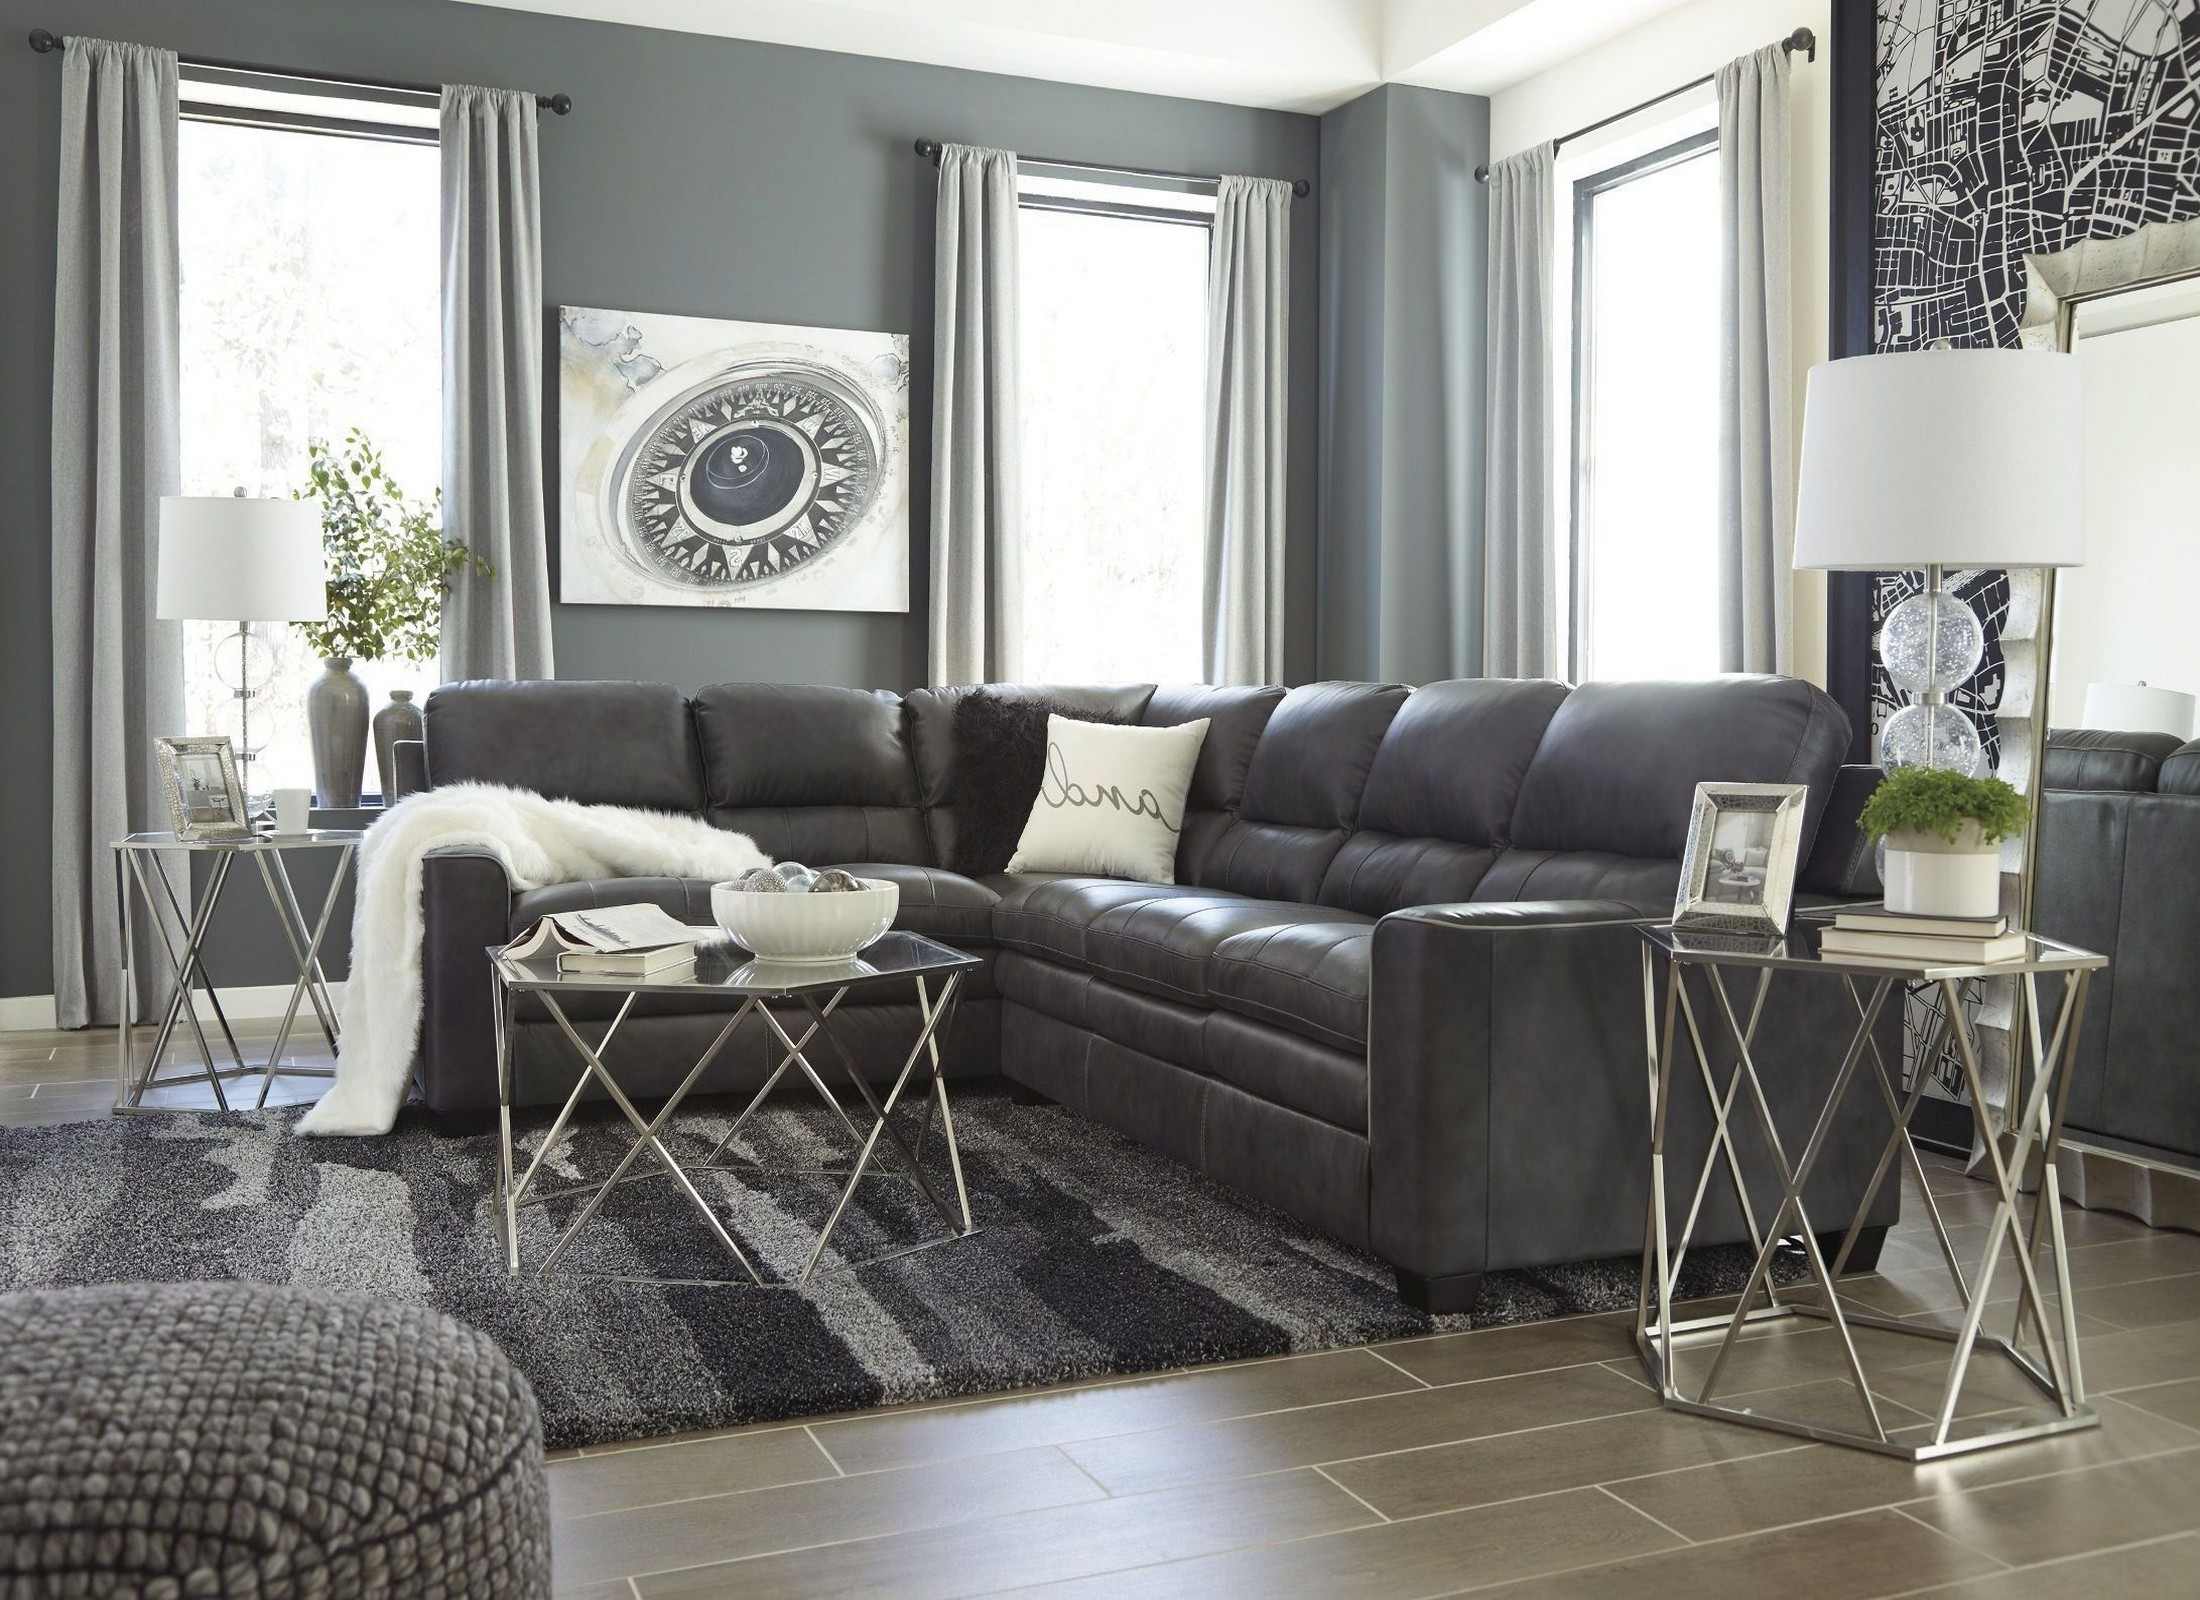 sectional sofa corner wedge mah jong preis gleason charcoal raf from ashley | coleman furniture